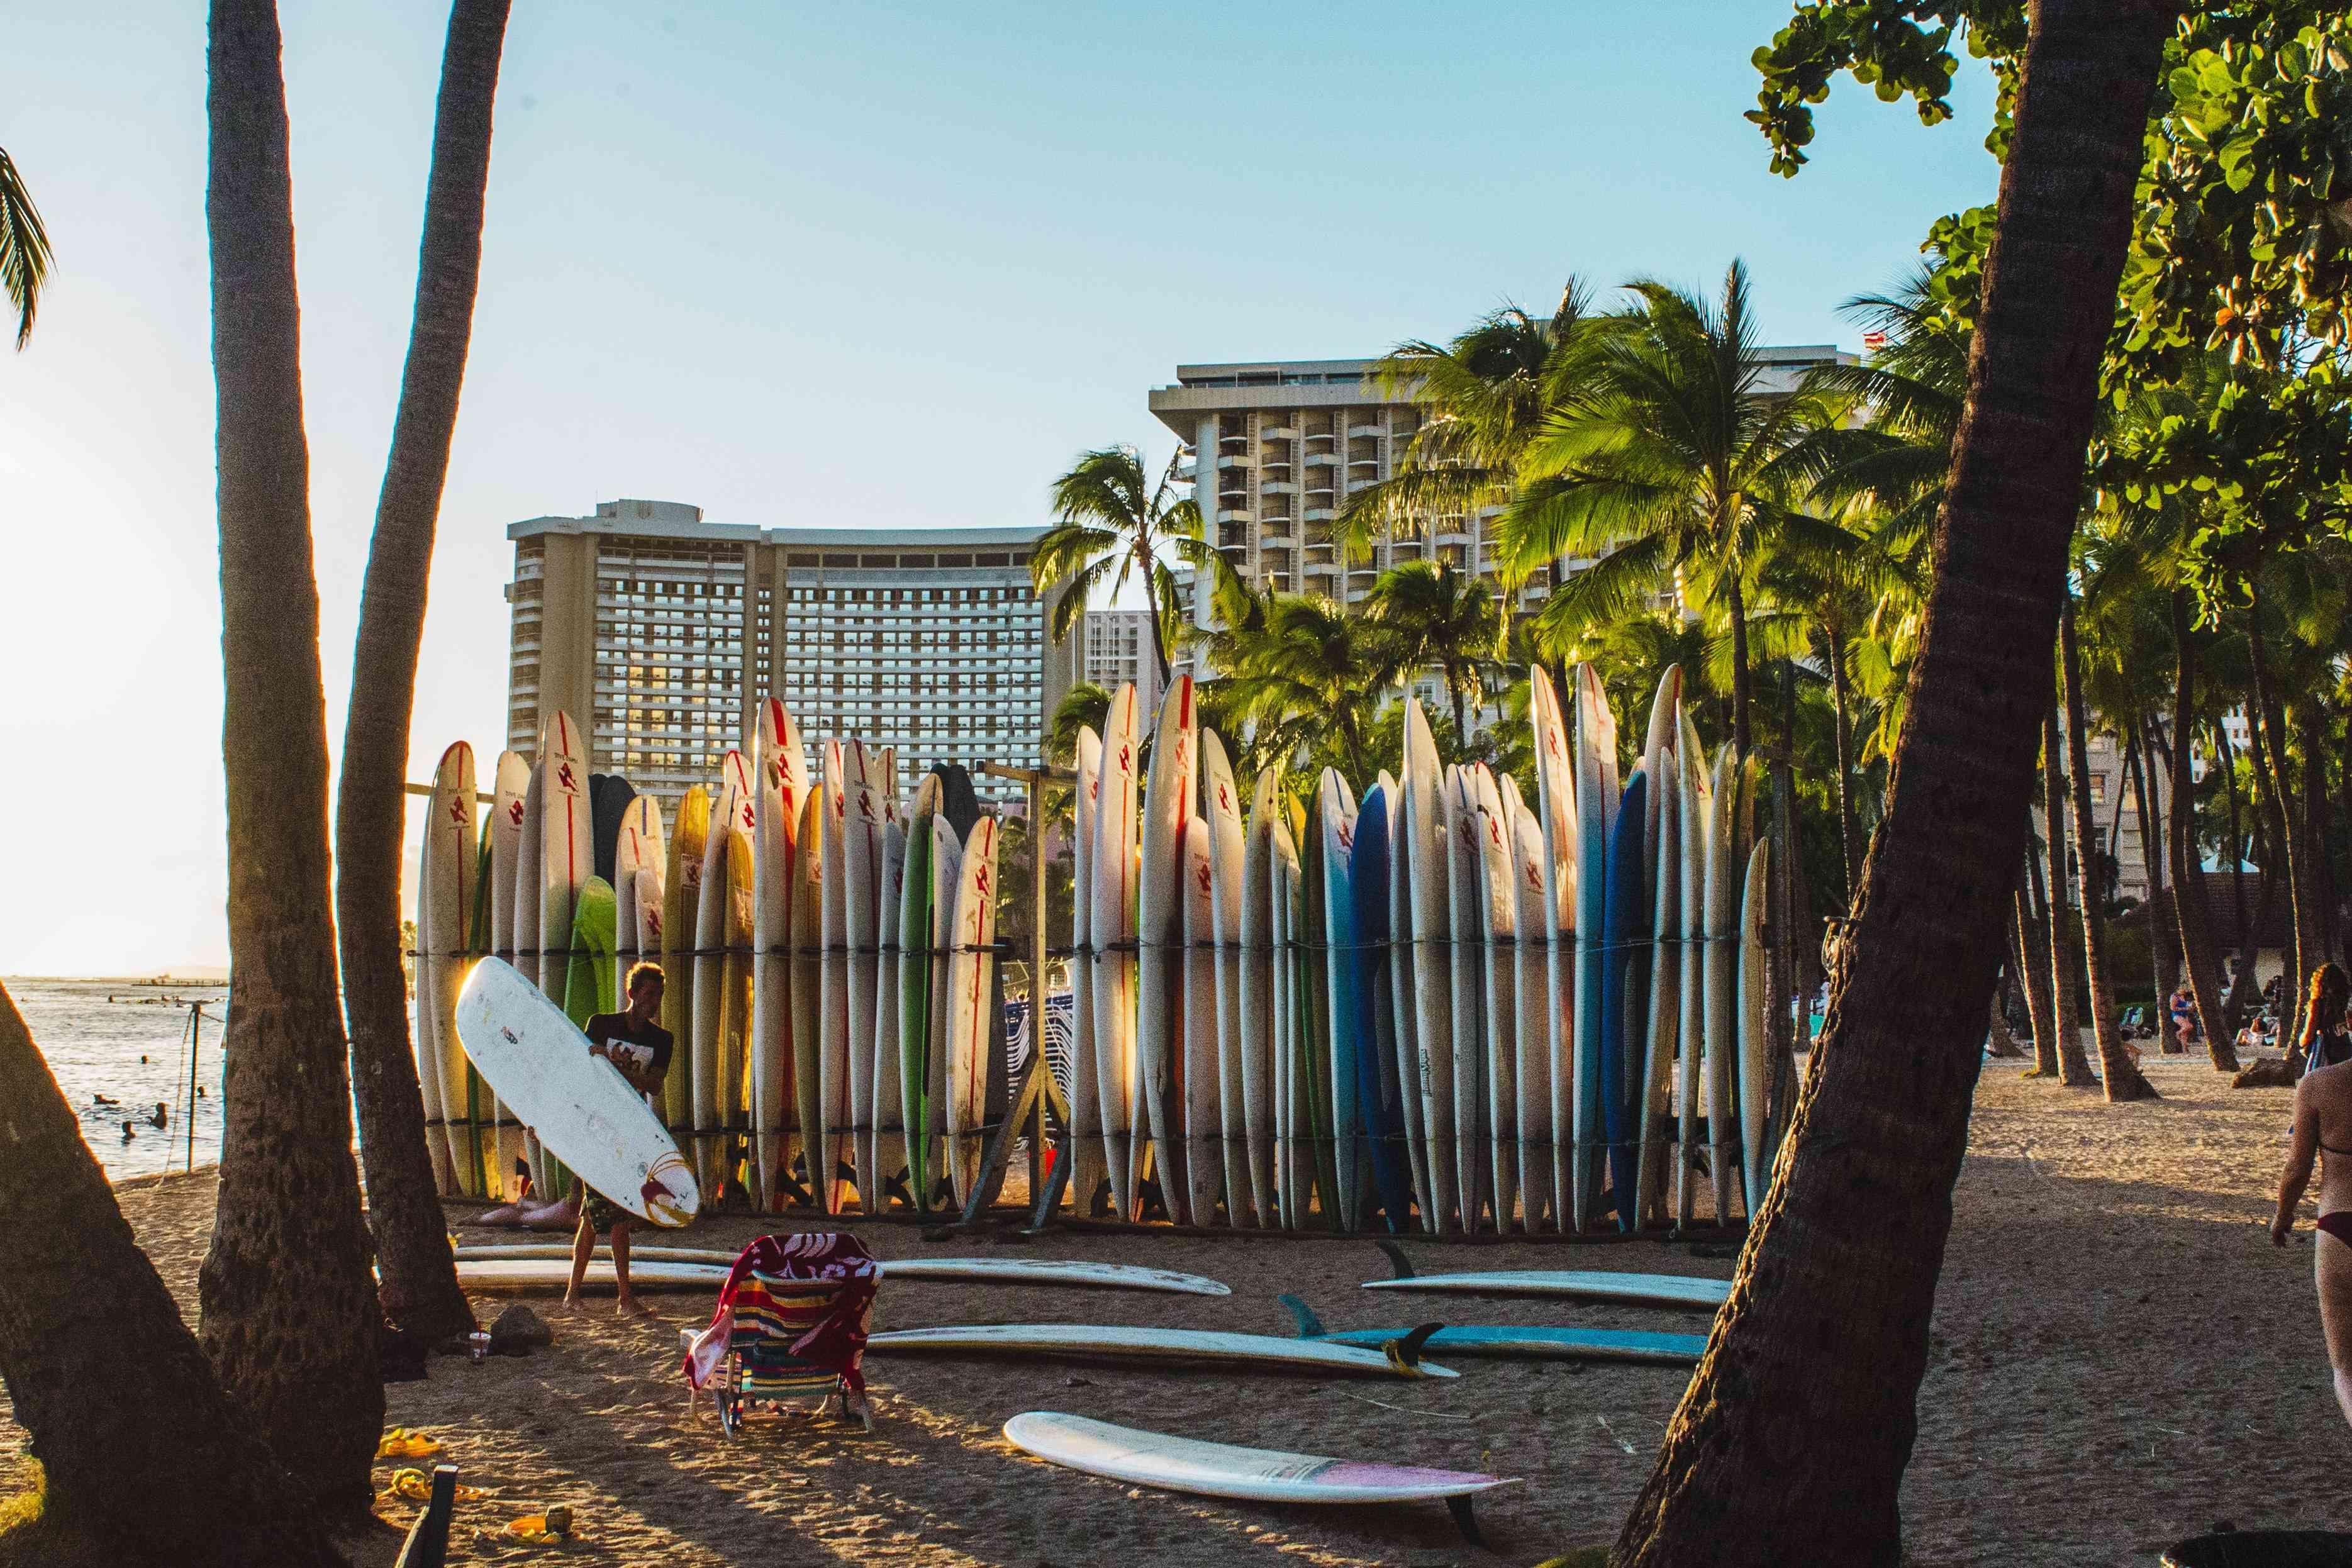 A line of surfboards in Waikiki